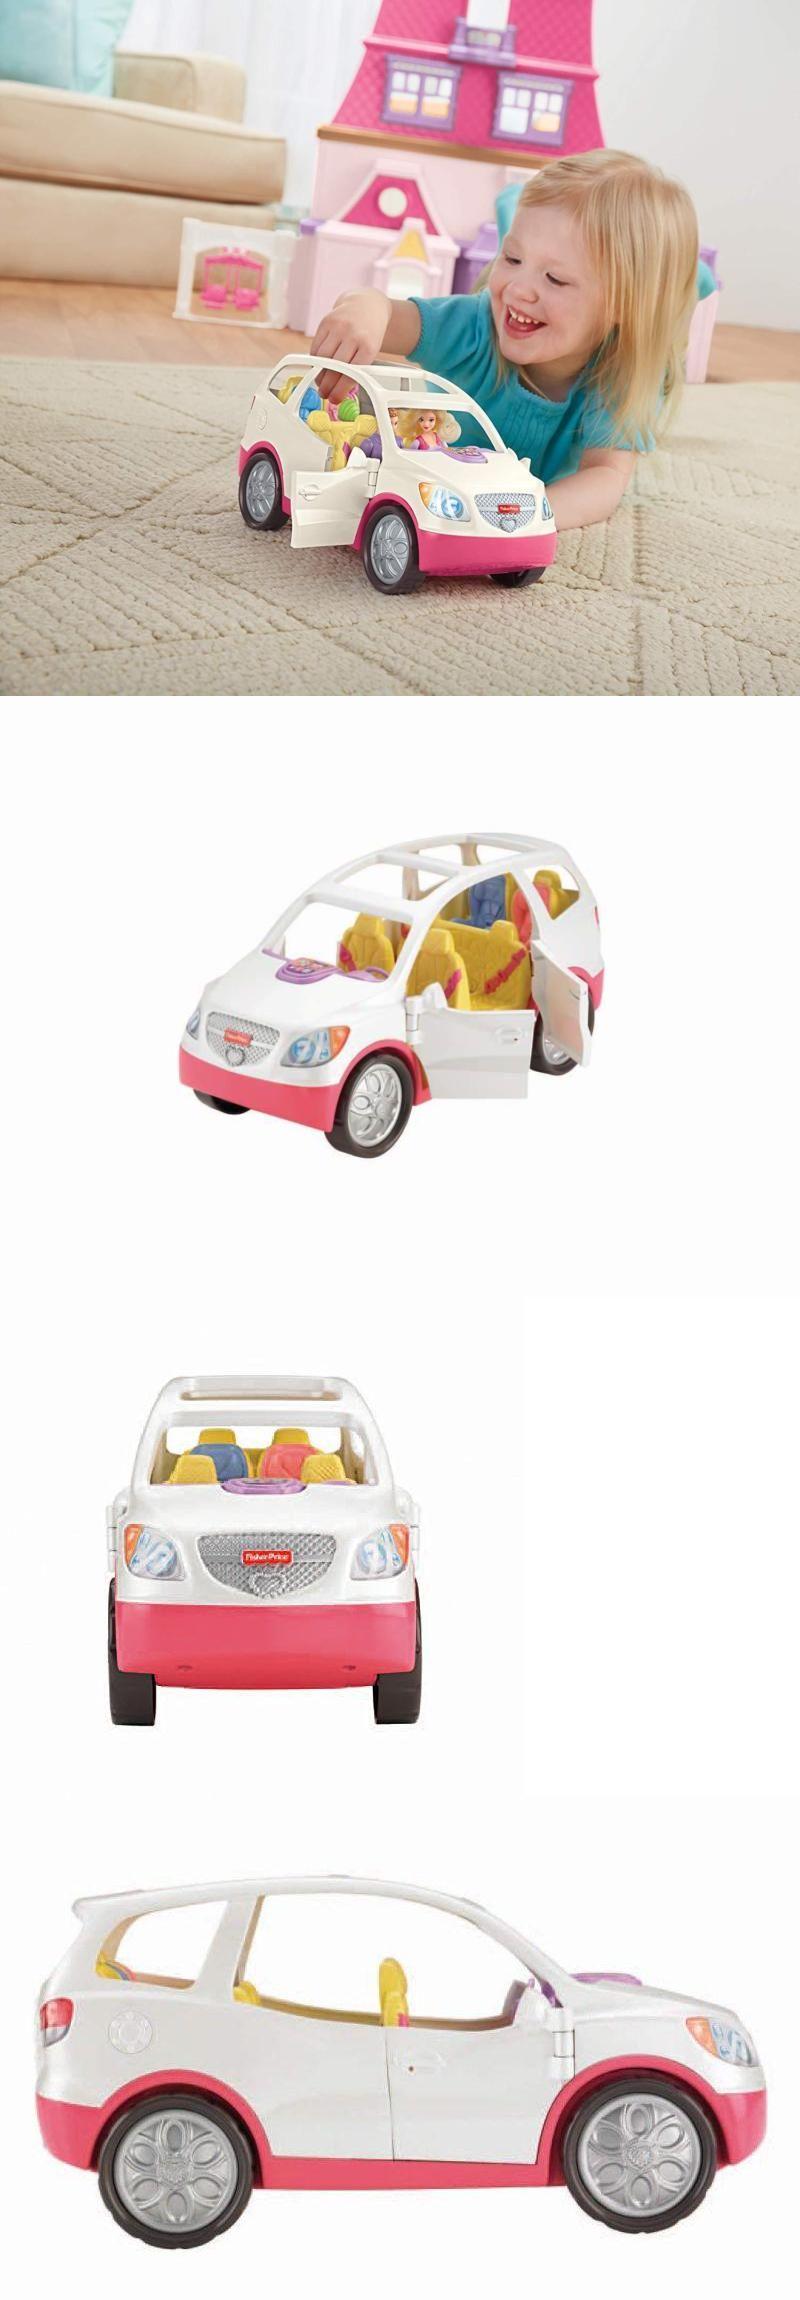 Dollhouses 20898 Loving Family Suv Fisher Price Van Car Dollhouse